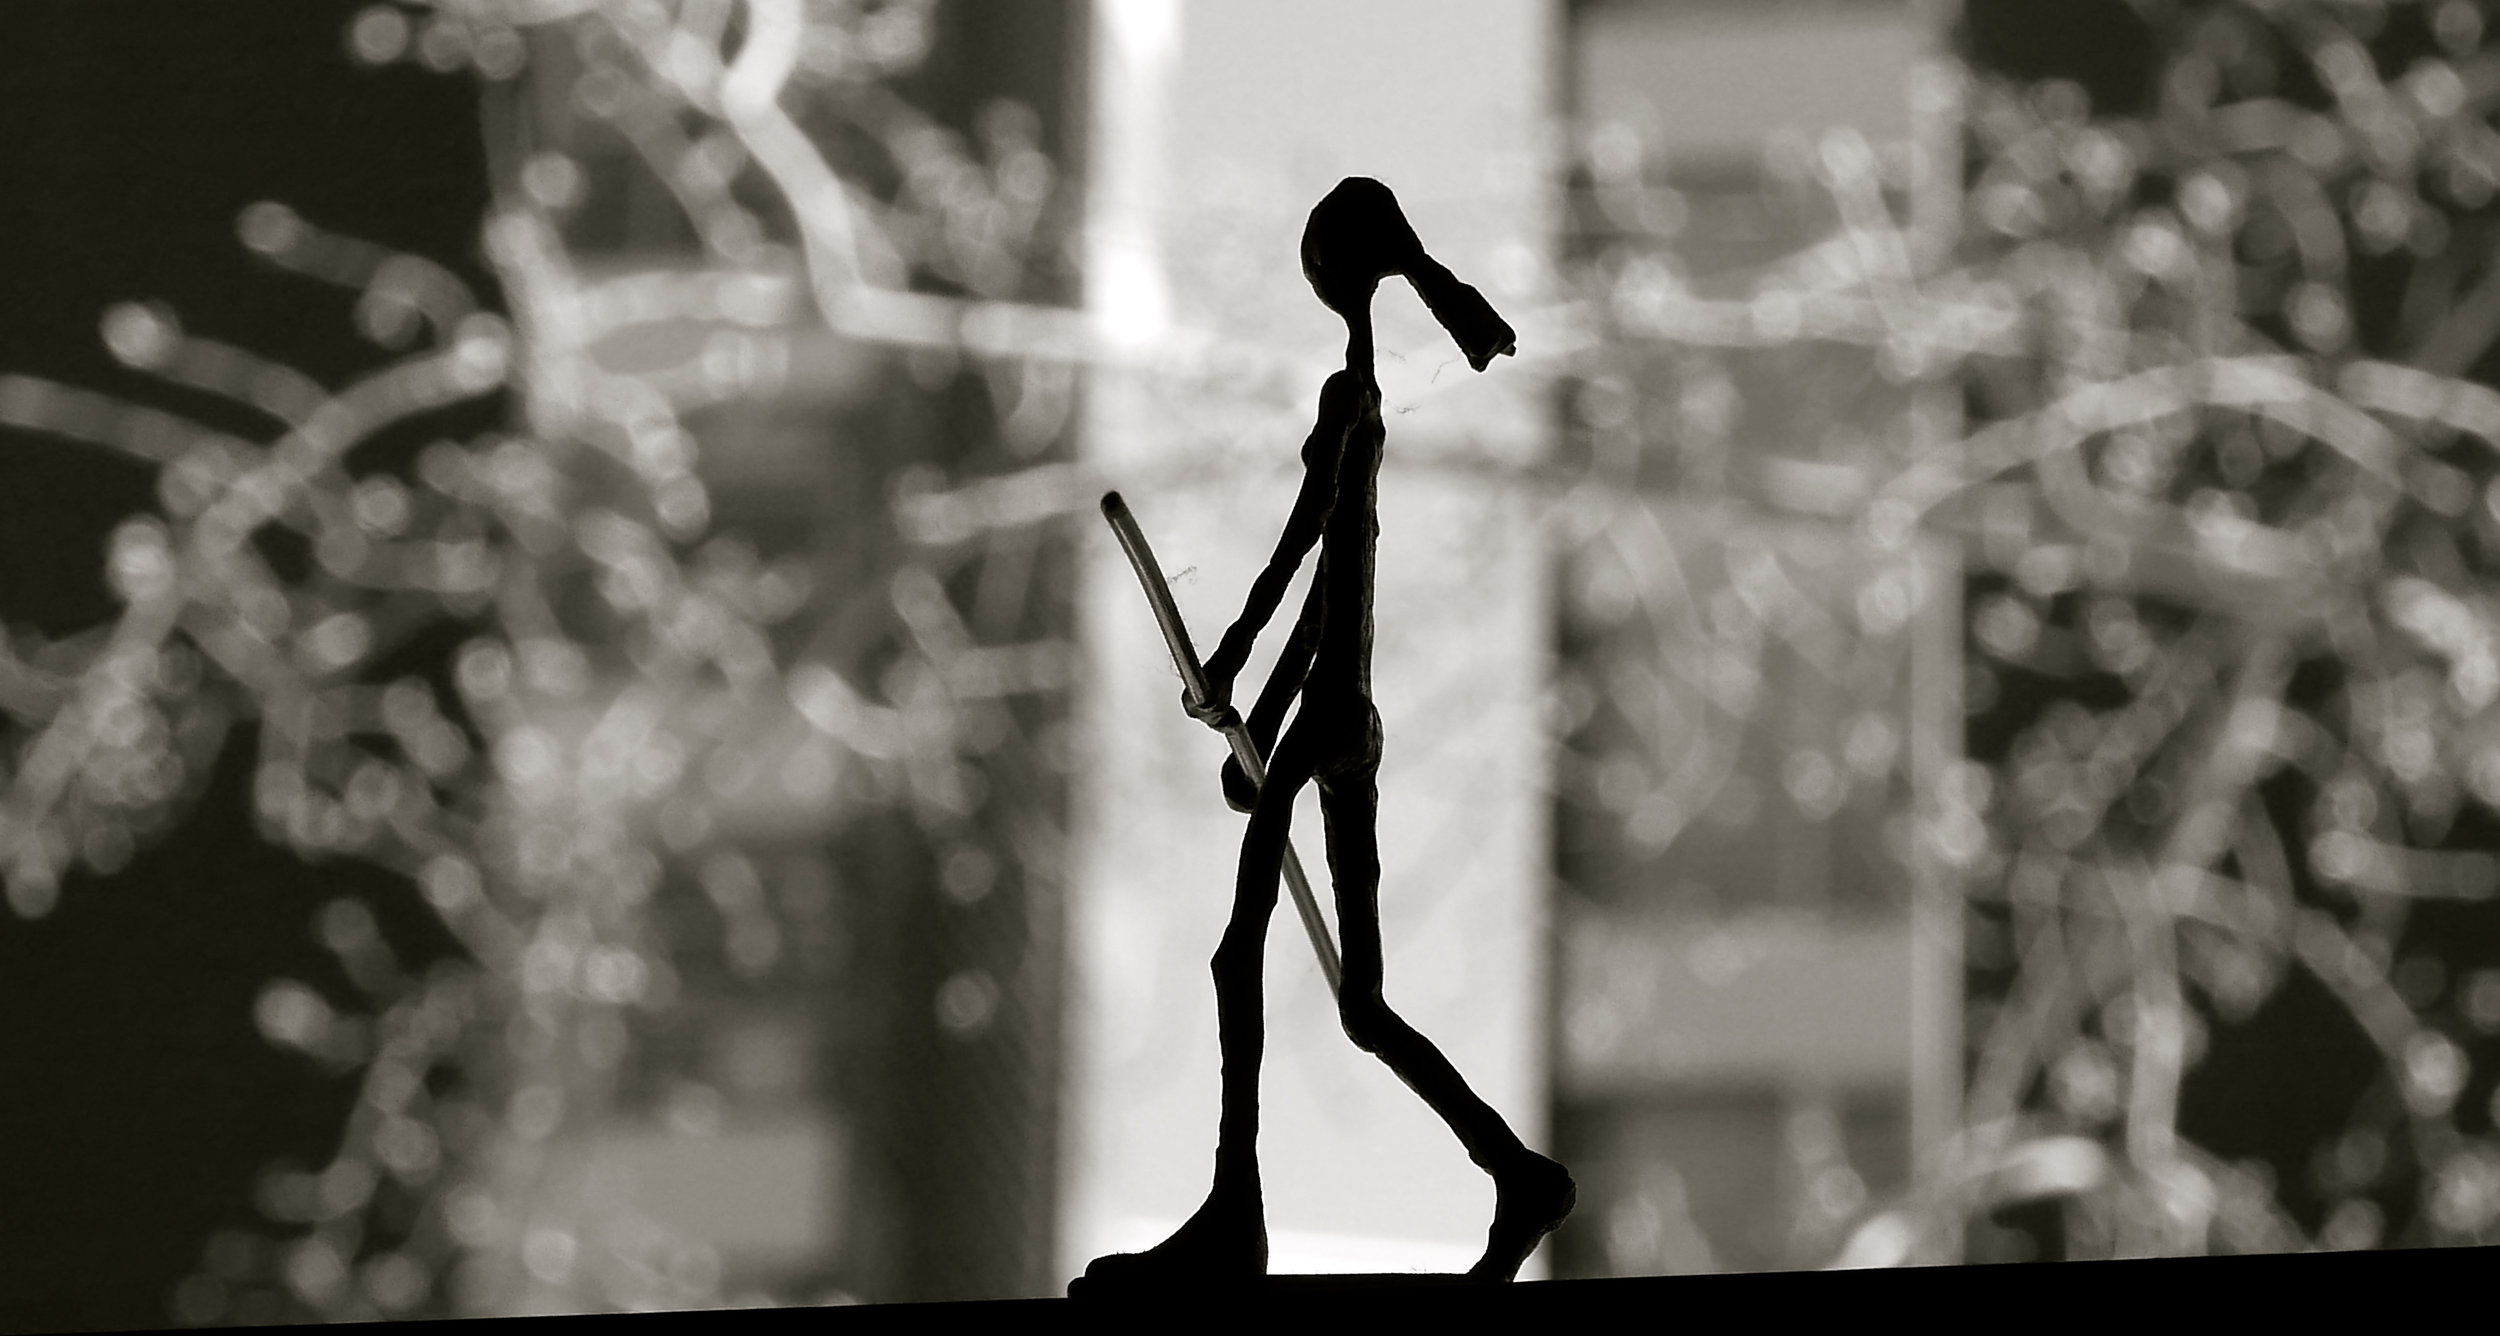 Silueta funambulista escultura